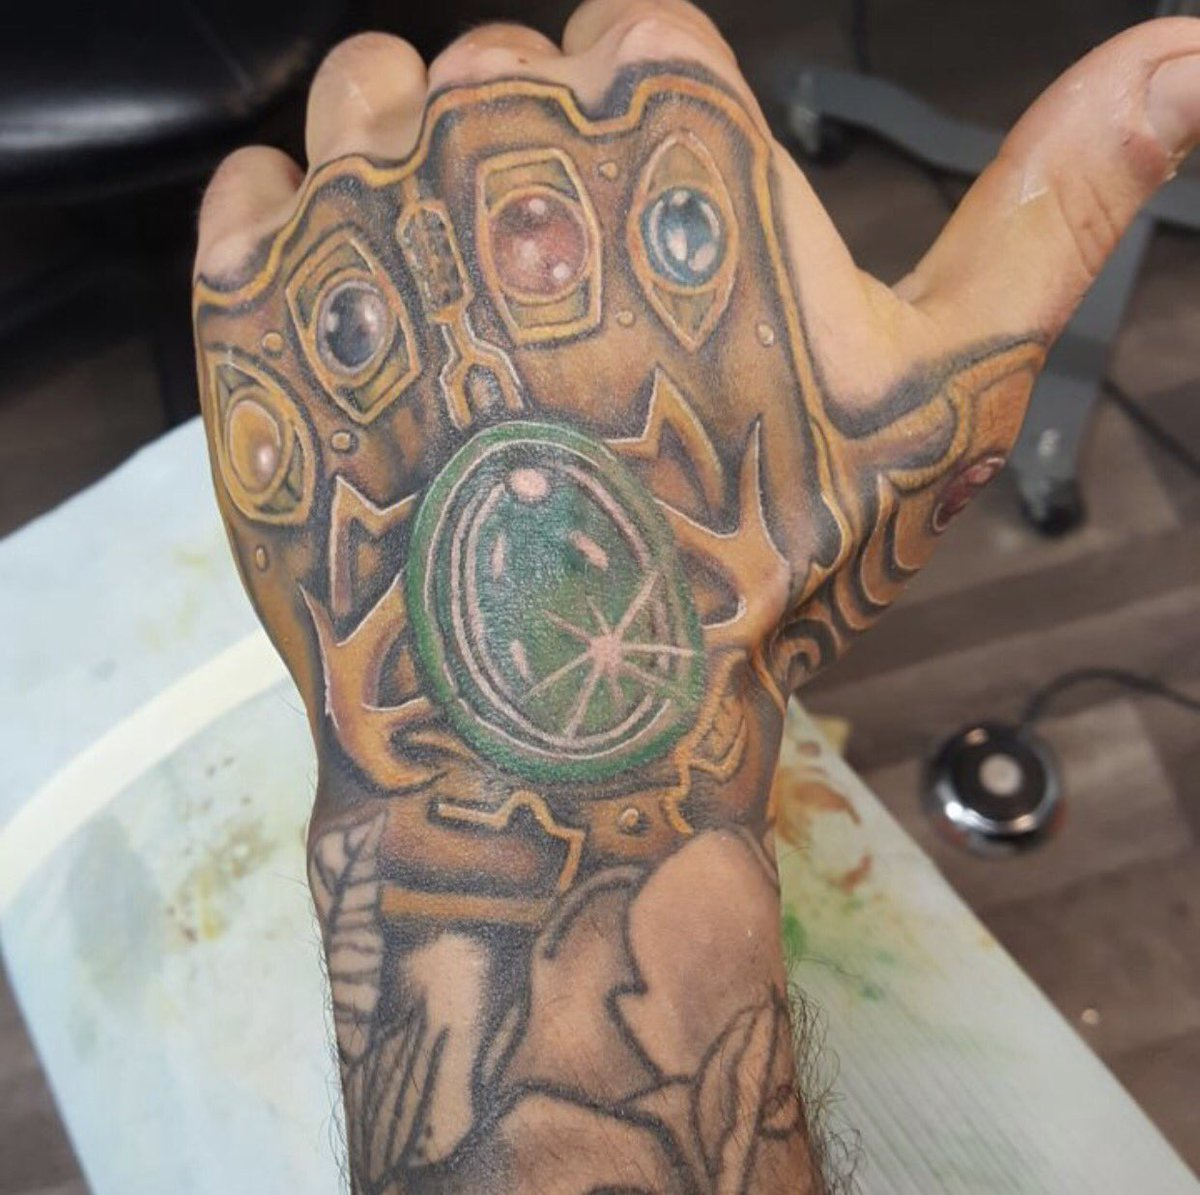 12 marvel tattoos dentelle blanche bracelets henn 233 tattooforaweek com tatouage. Black Bedroom Furniture Sets. Home Design Ideas